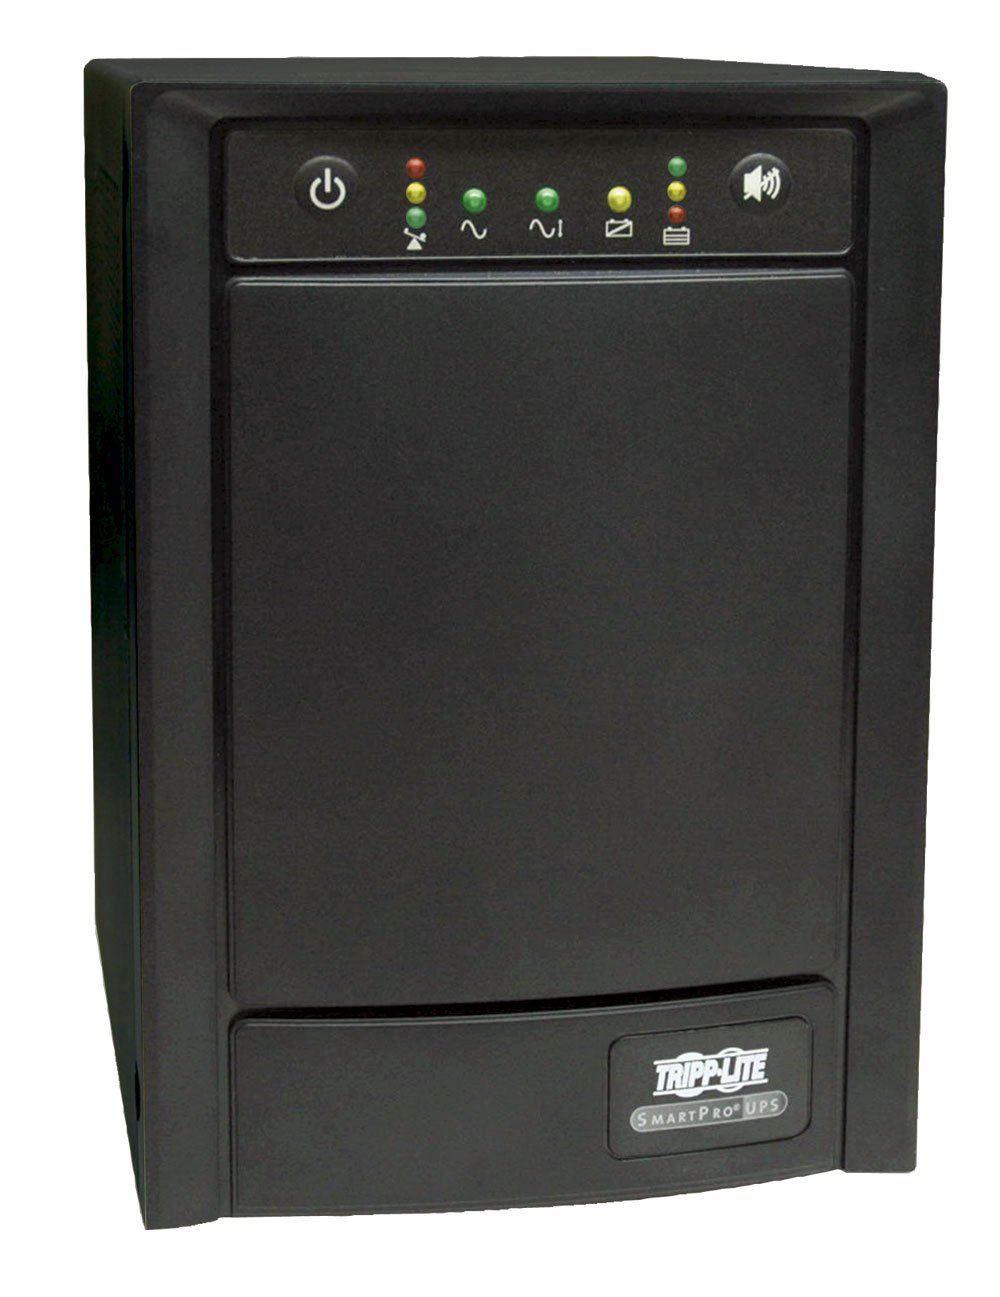 Tripp Lite SMART1500SLT 1500VA 900W UPS Smart Tower AVR 120V USB DB9 SNMP for Servers, 8 Outlets by Tripp Lite